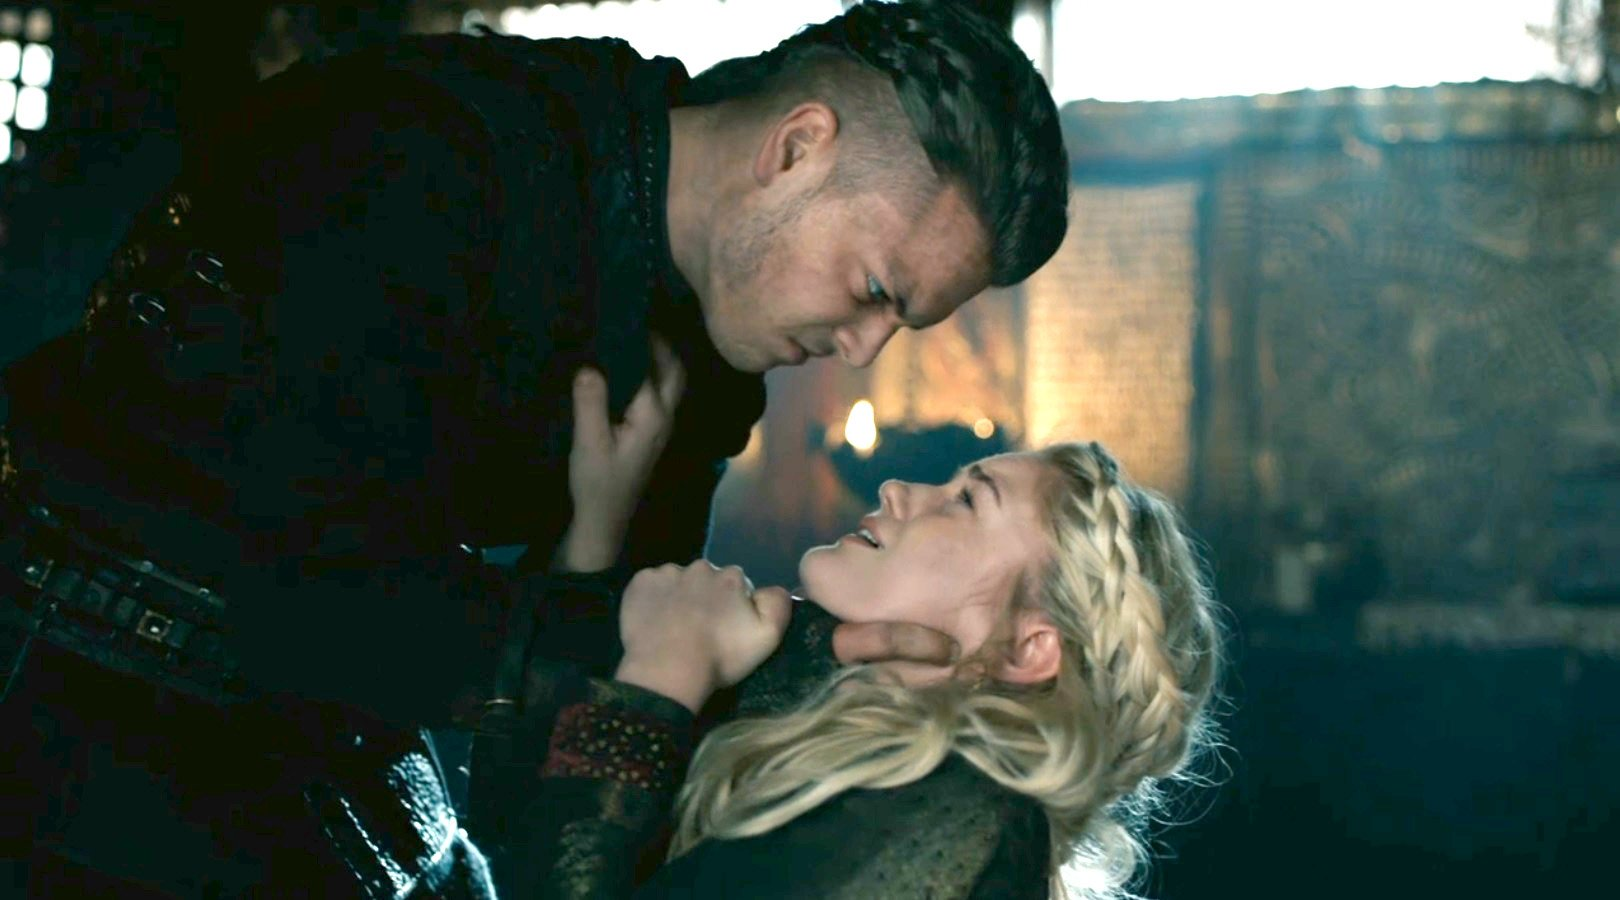 Vikings - Season 5, Episode 19. Freydis (Picture: History)